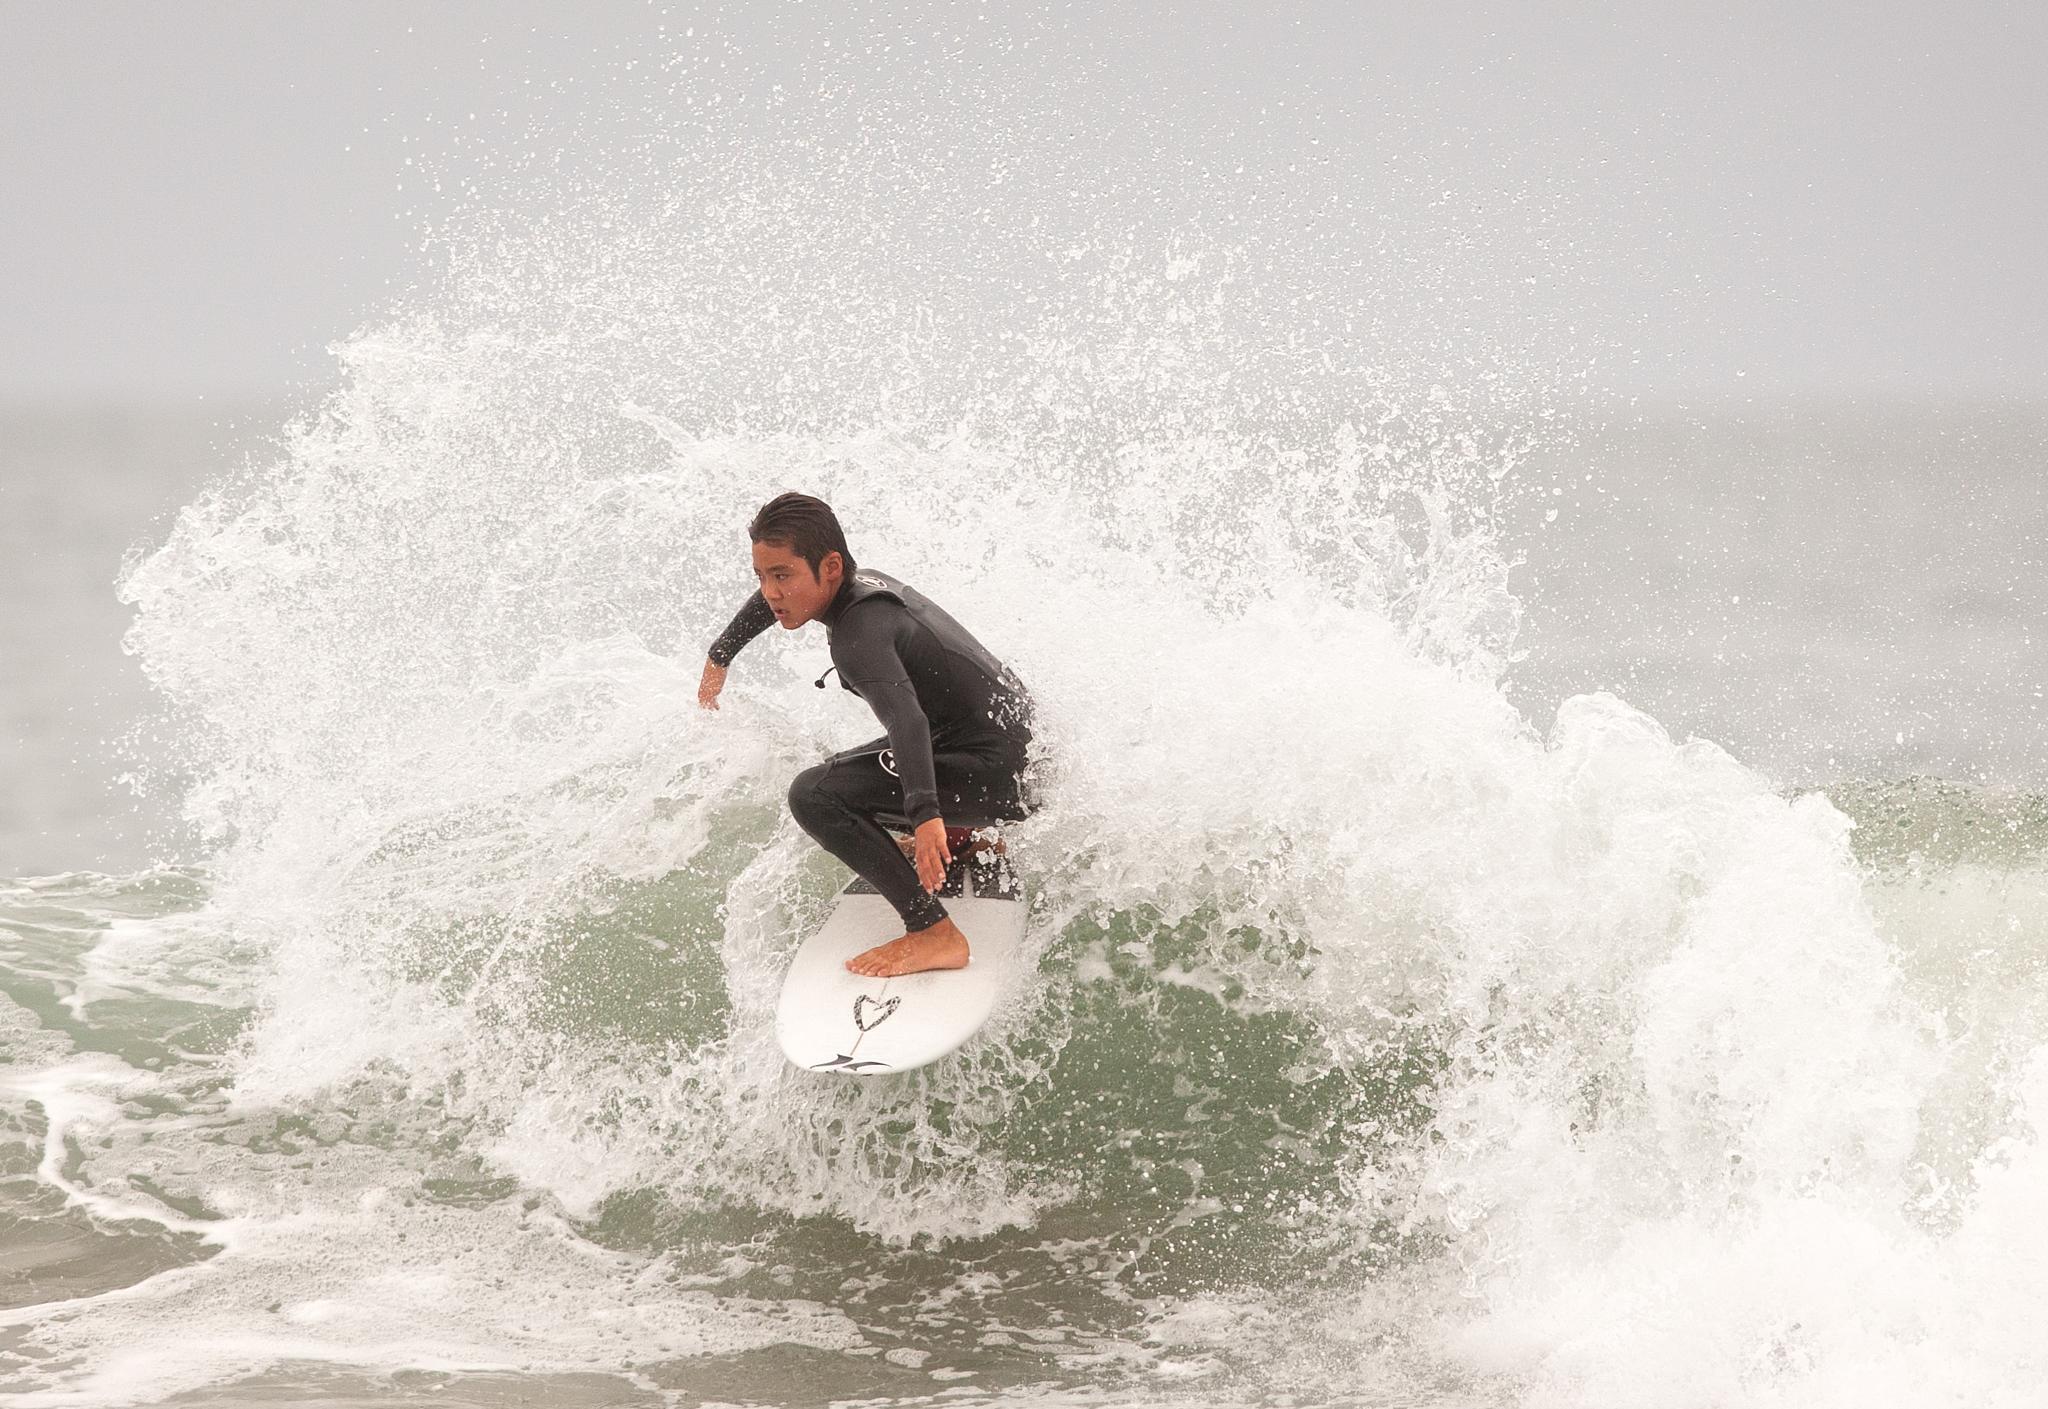 Taro Watanabe - a young surfer at Huntington Beach Pier Southside 08.22.2015 by blueskyoveraquatic